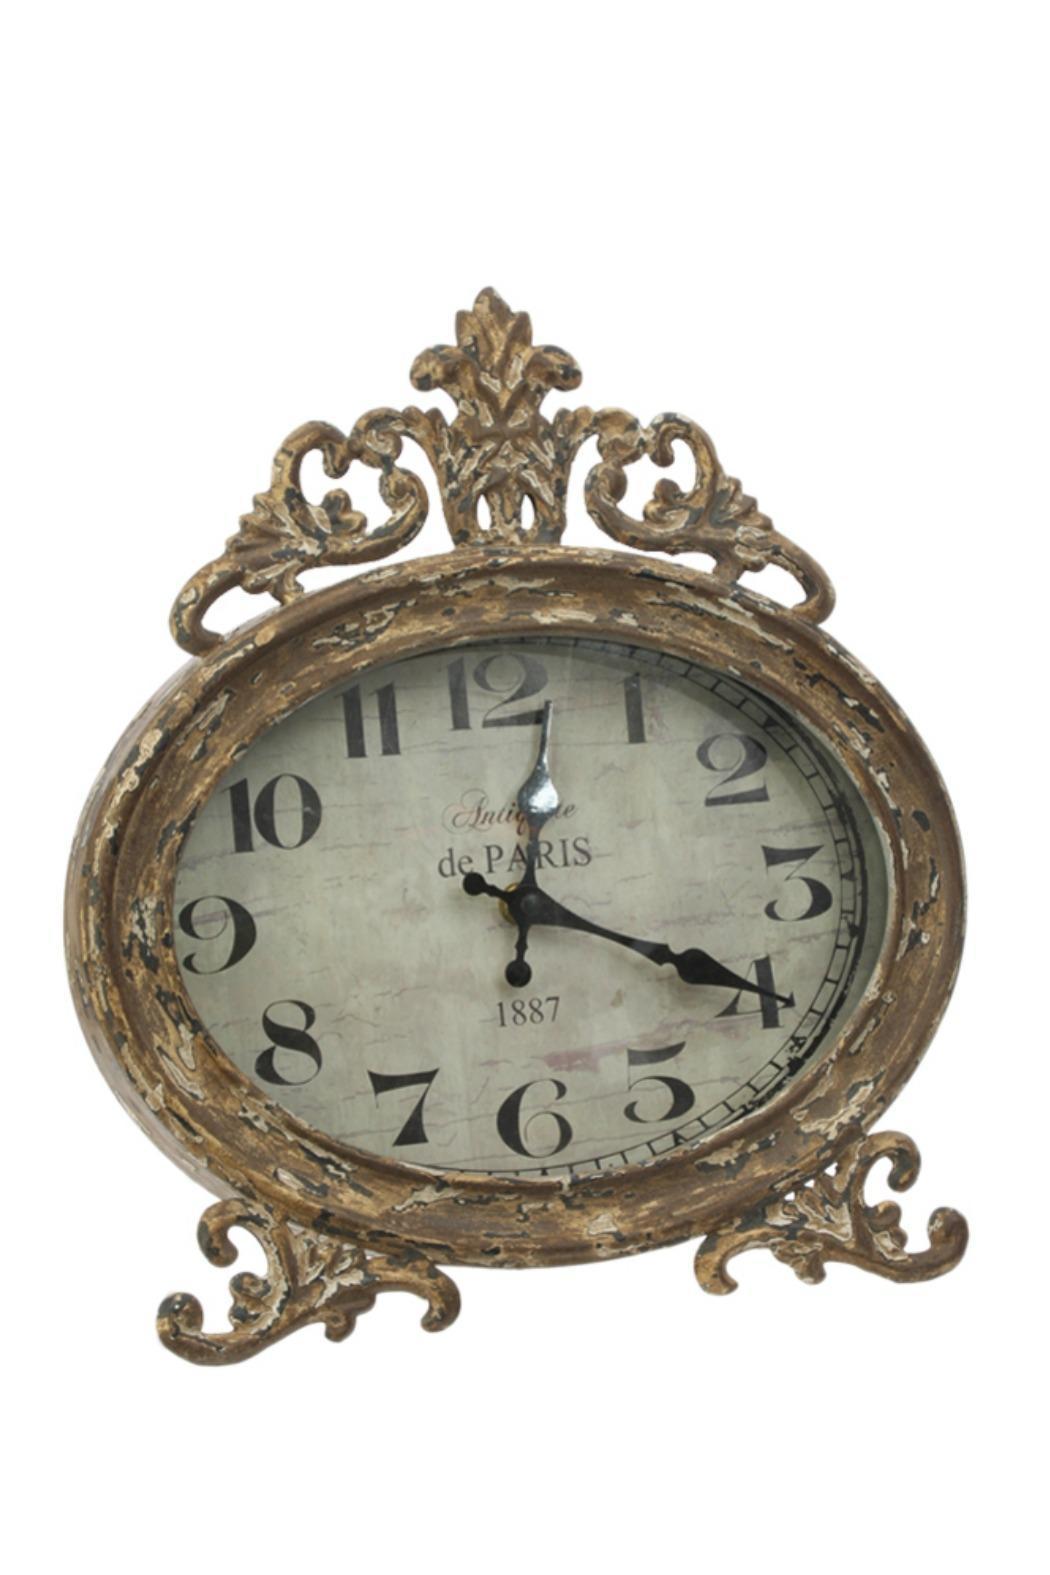 1887 desk clock raz imports.jpg